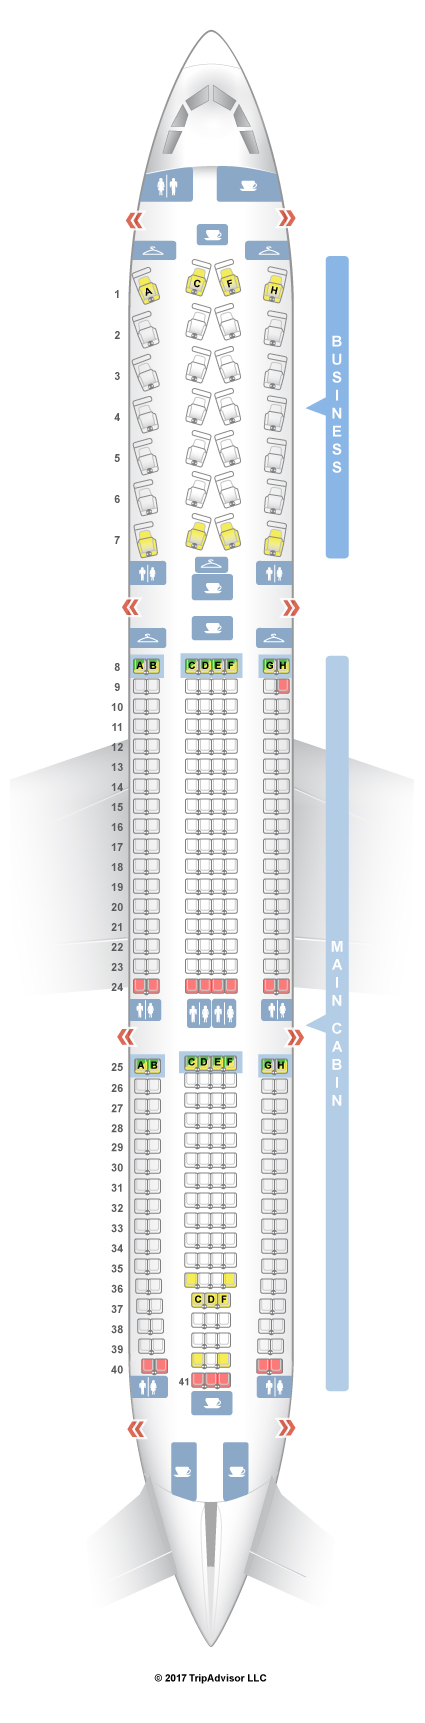 us airways plane seating chart